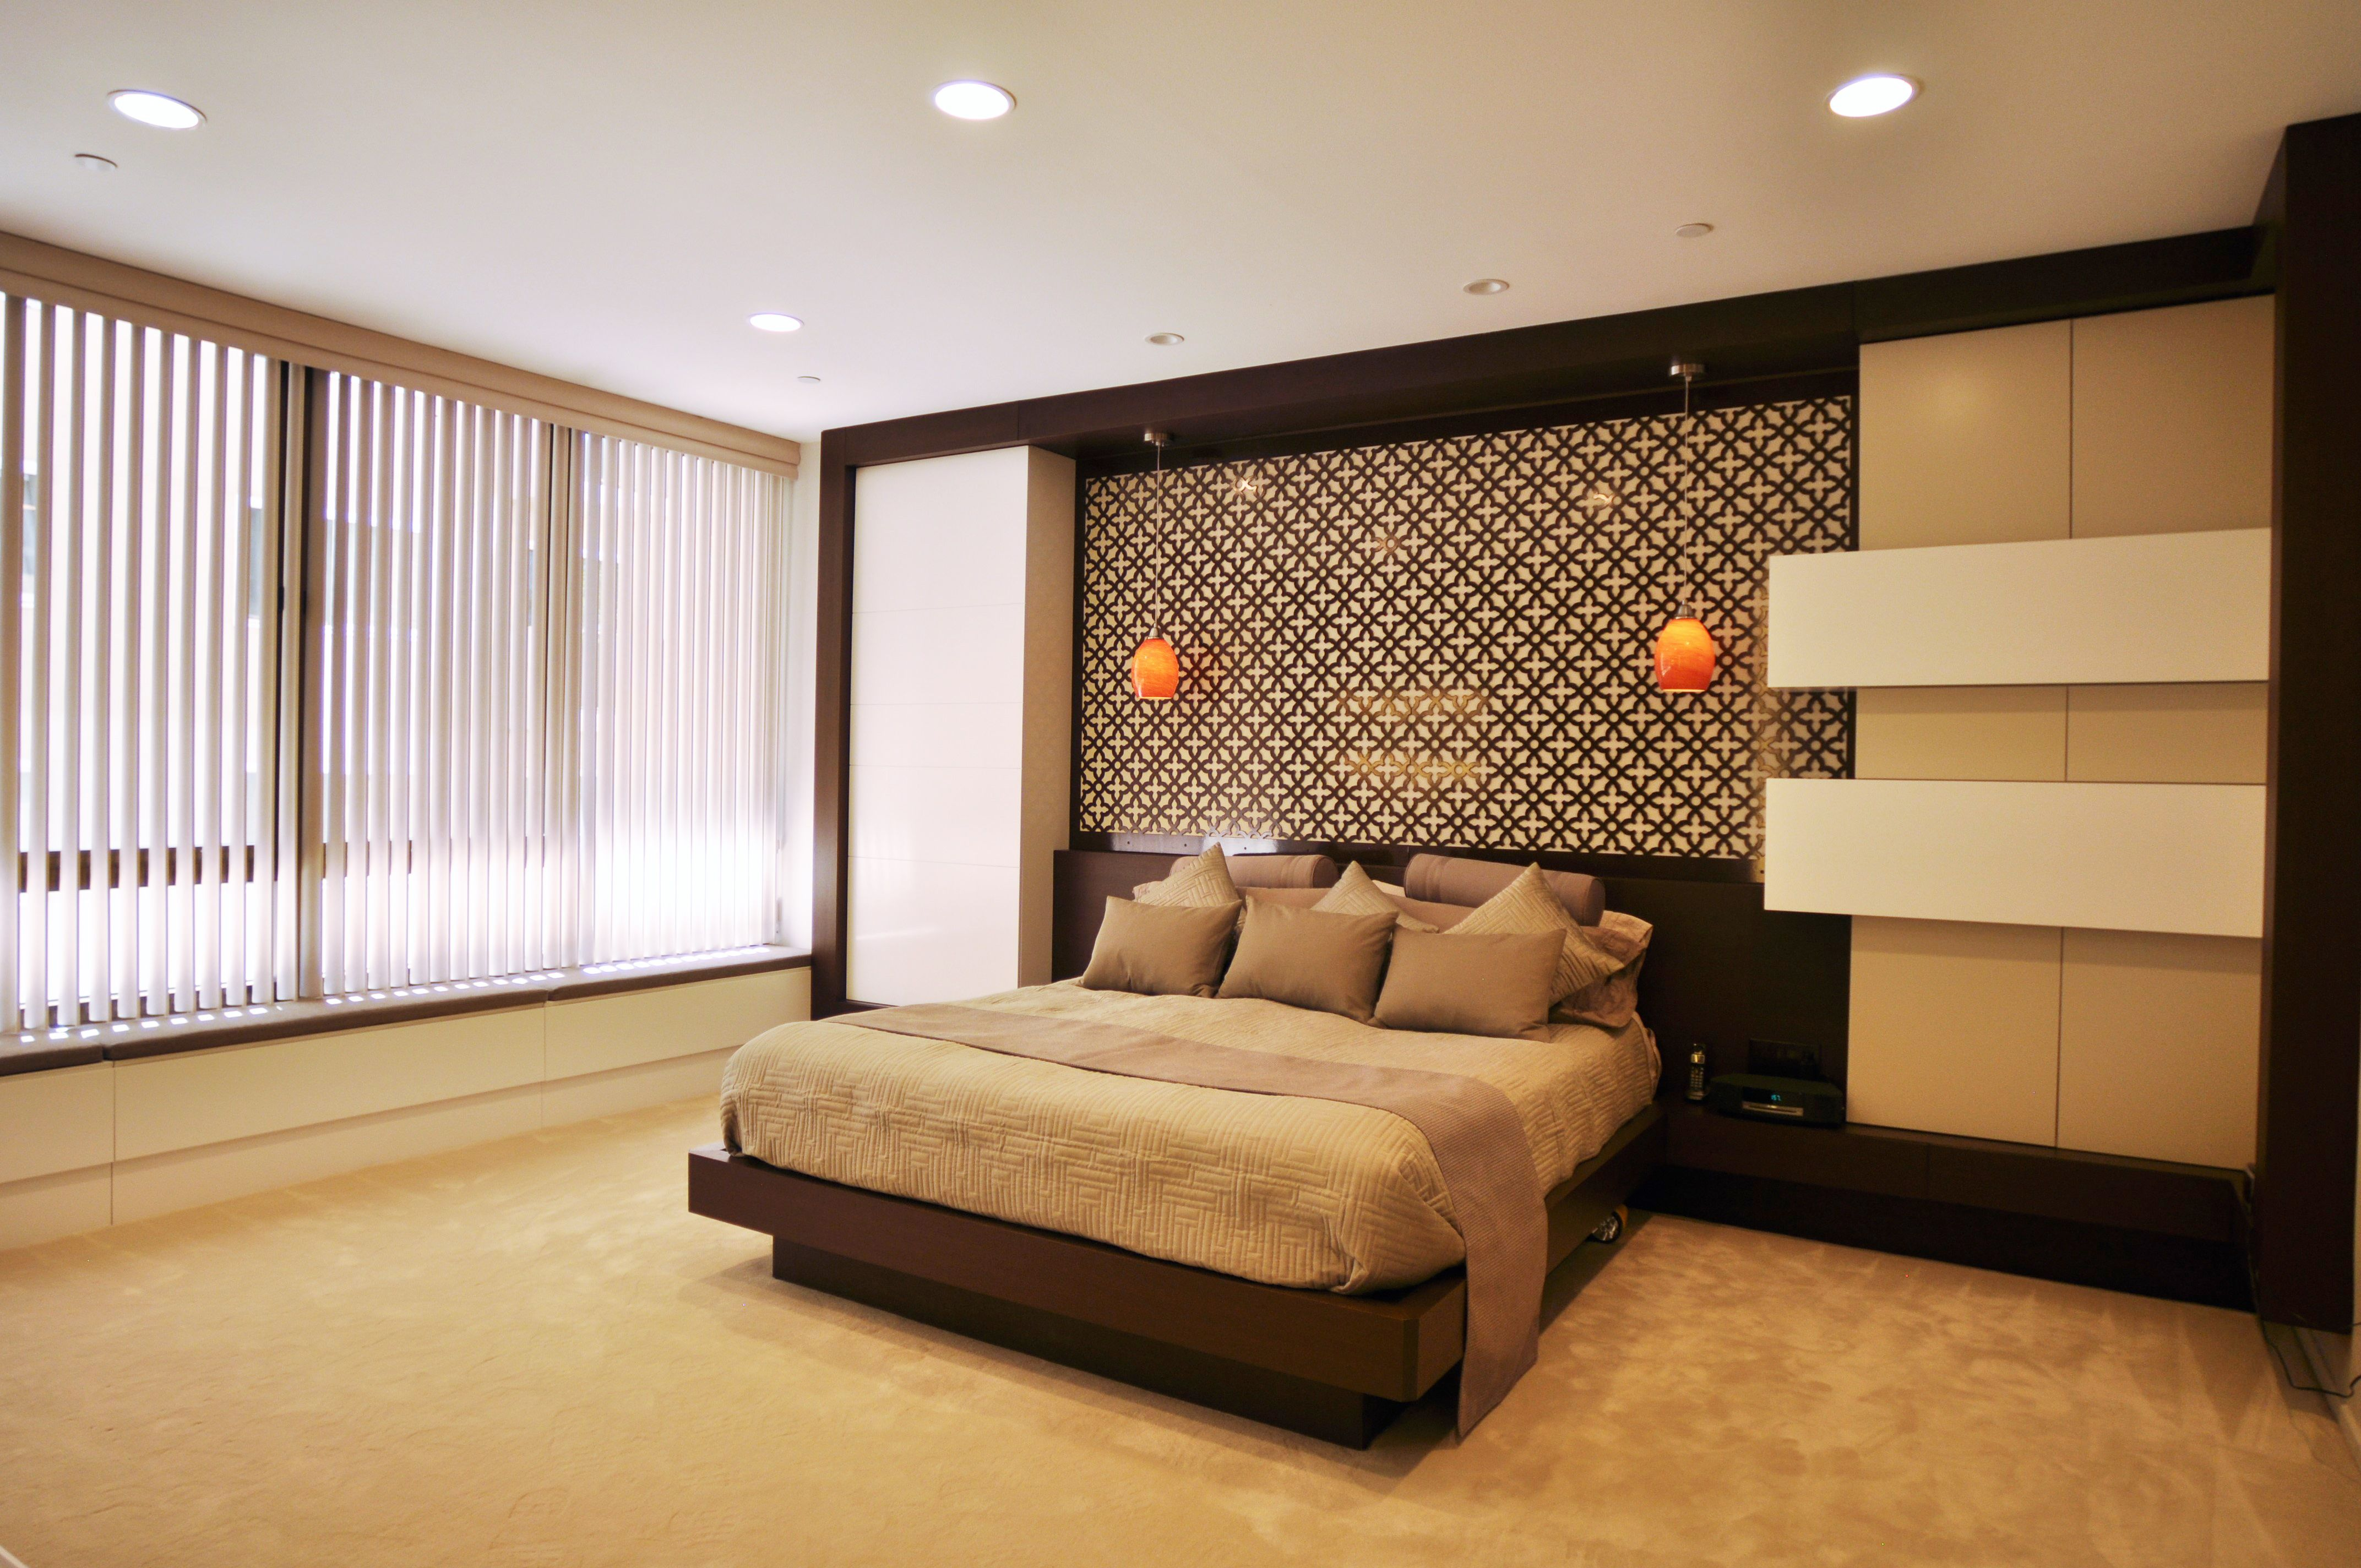 D'life home interiors - kottayam kottayam kerala karan goyal karangoyaljan on pinterest